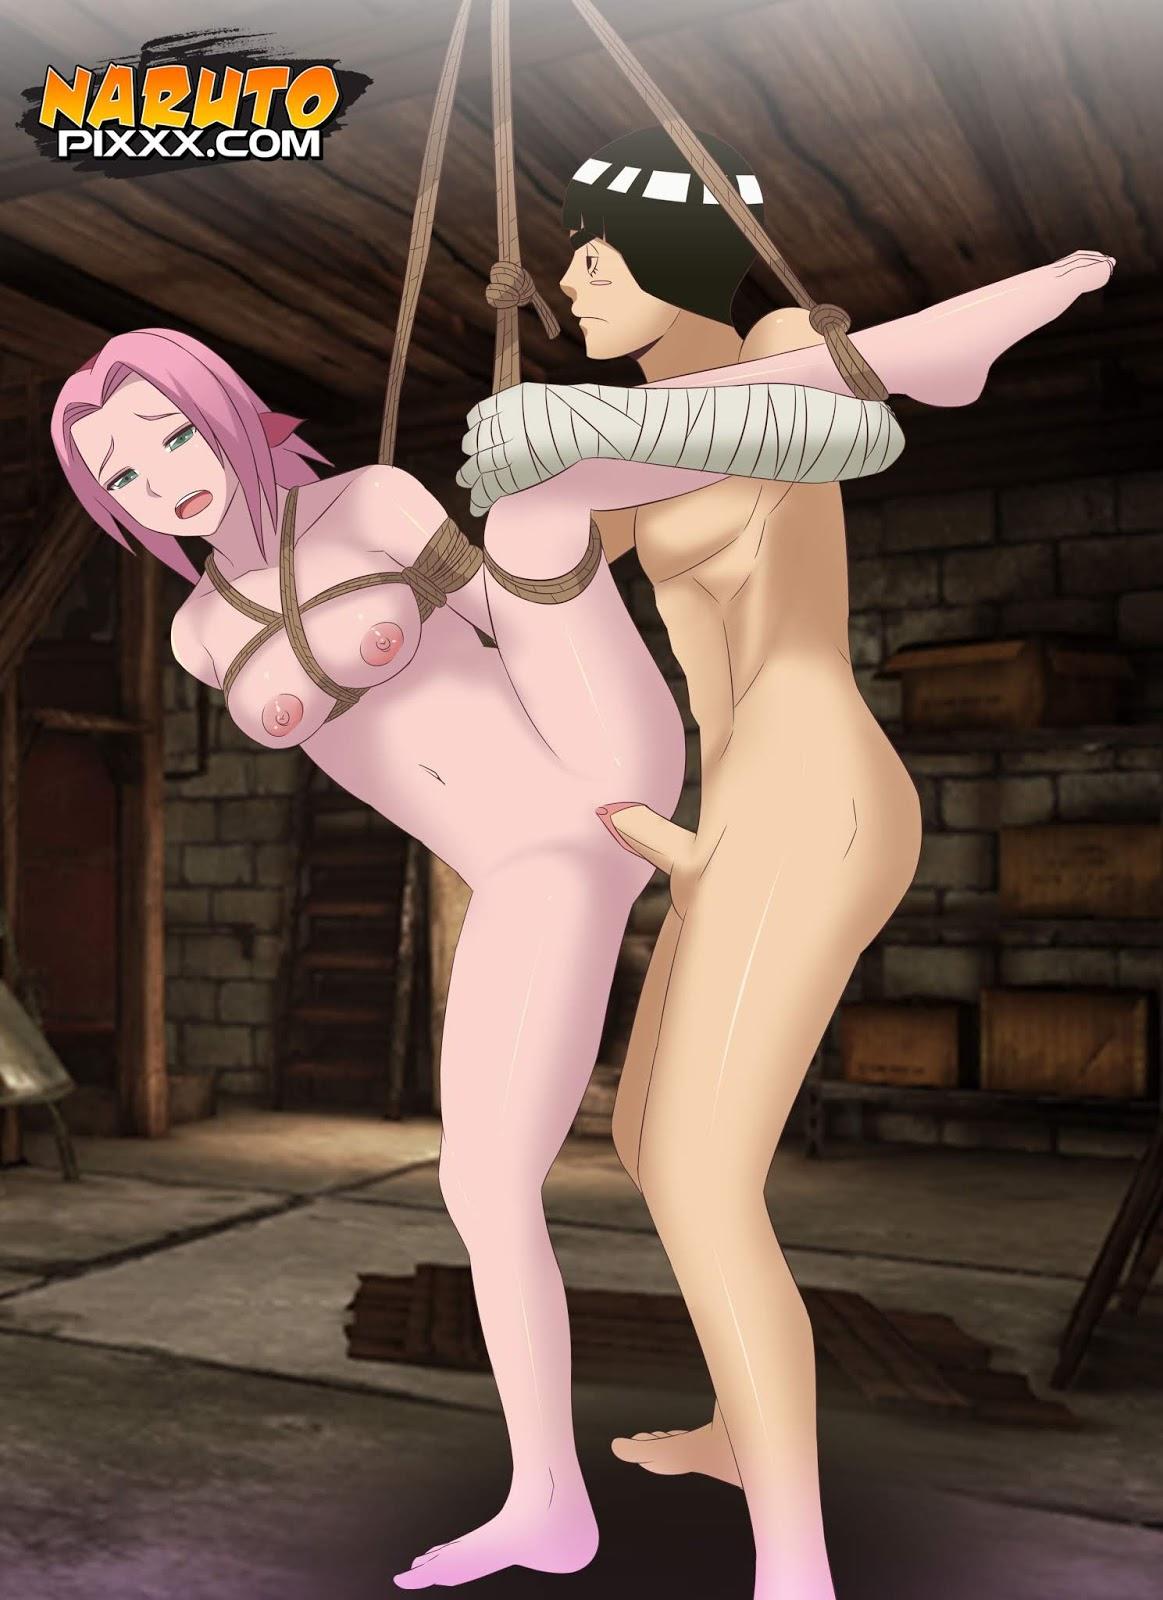 Drunken Rock Lee And Sakura by Koala | Naruto Pixxx